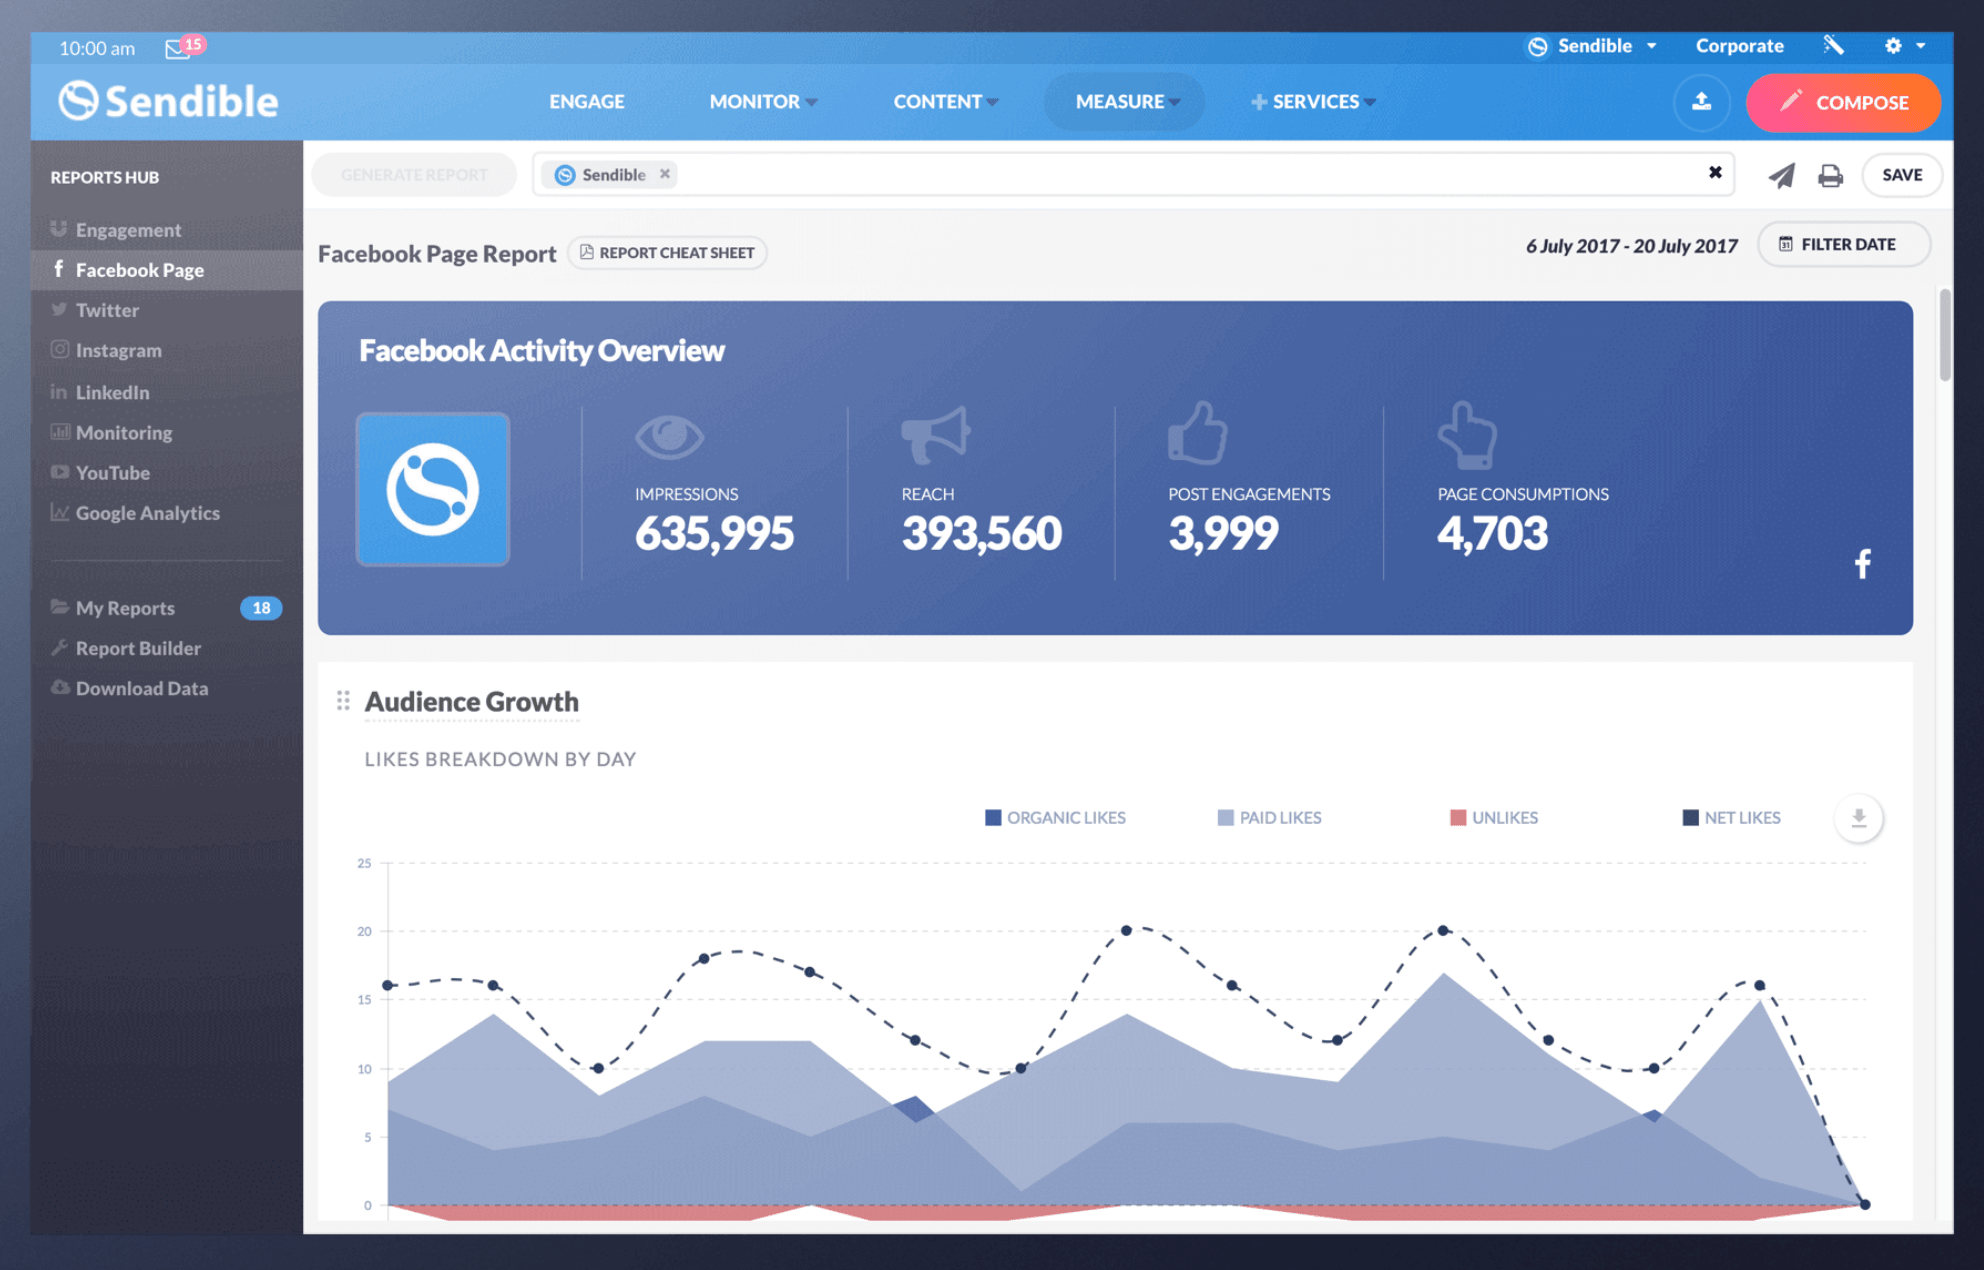 Sendible. One of The Best Social Media Management Sites